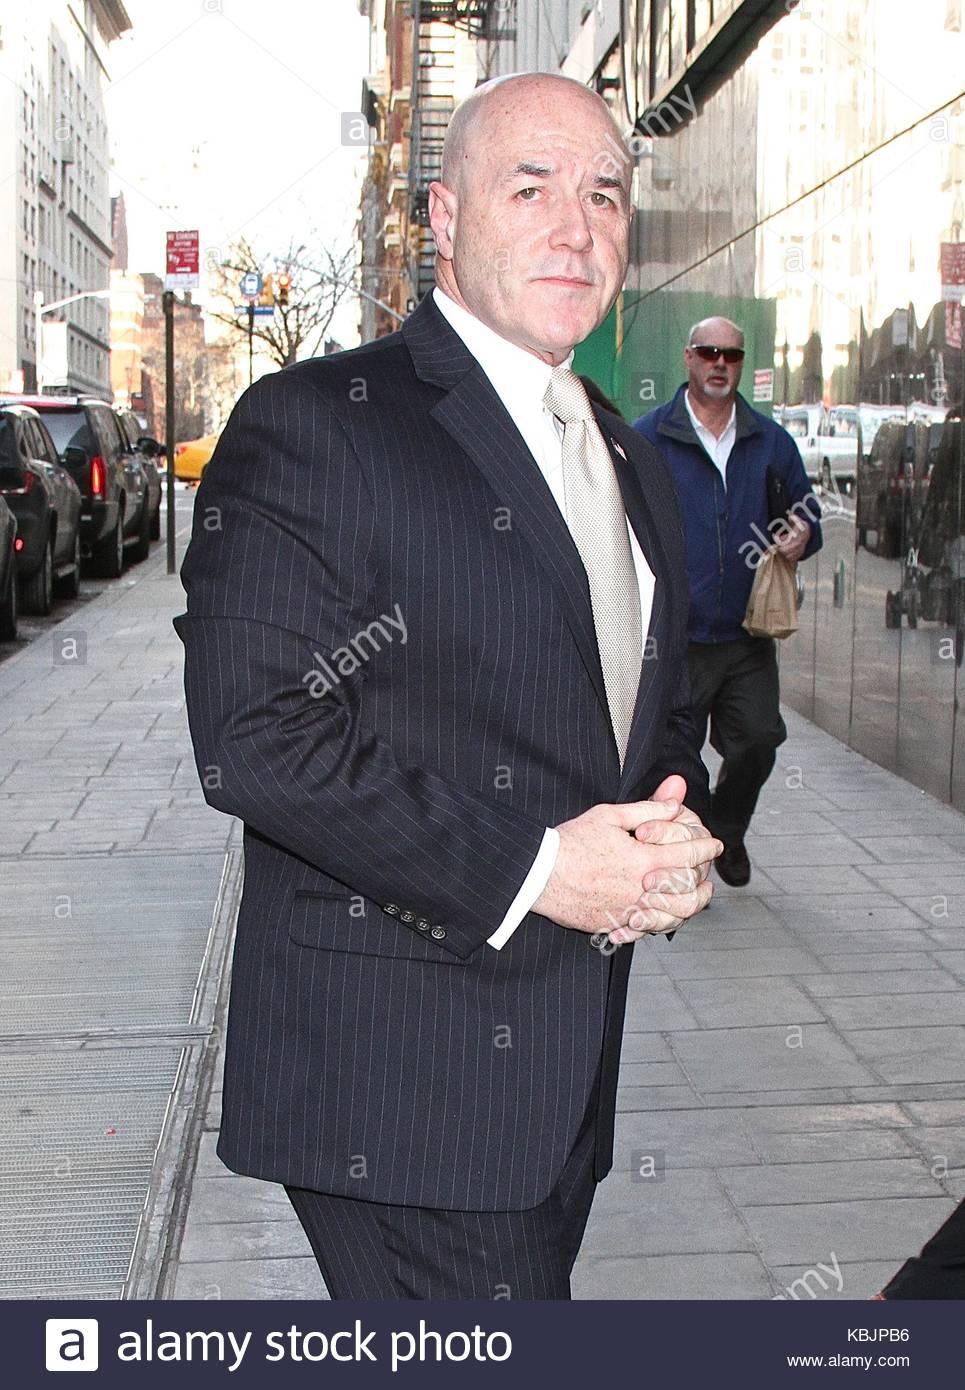 Bernard Kerik Former New York City Police Commissioner And Convicted Hala Matli